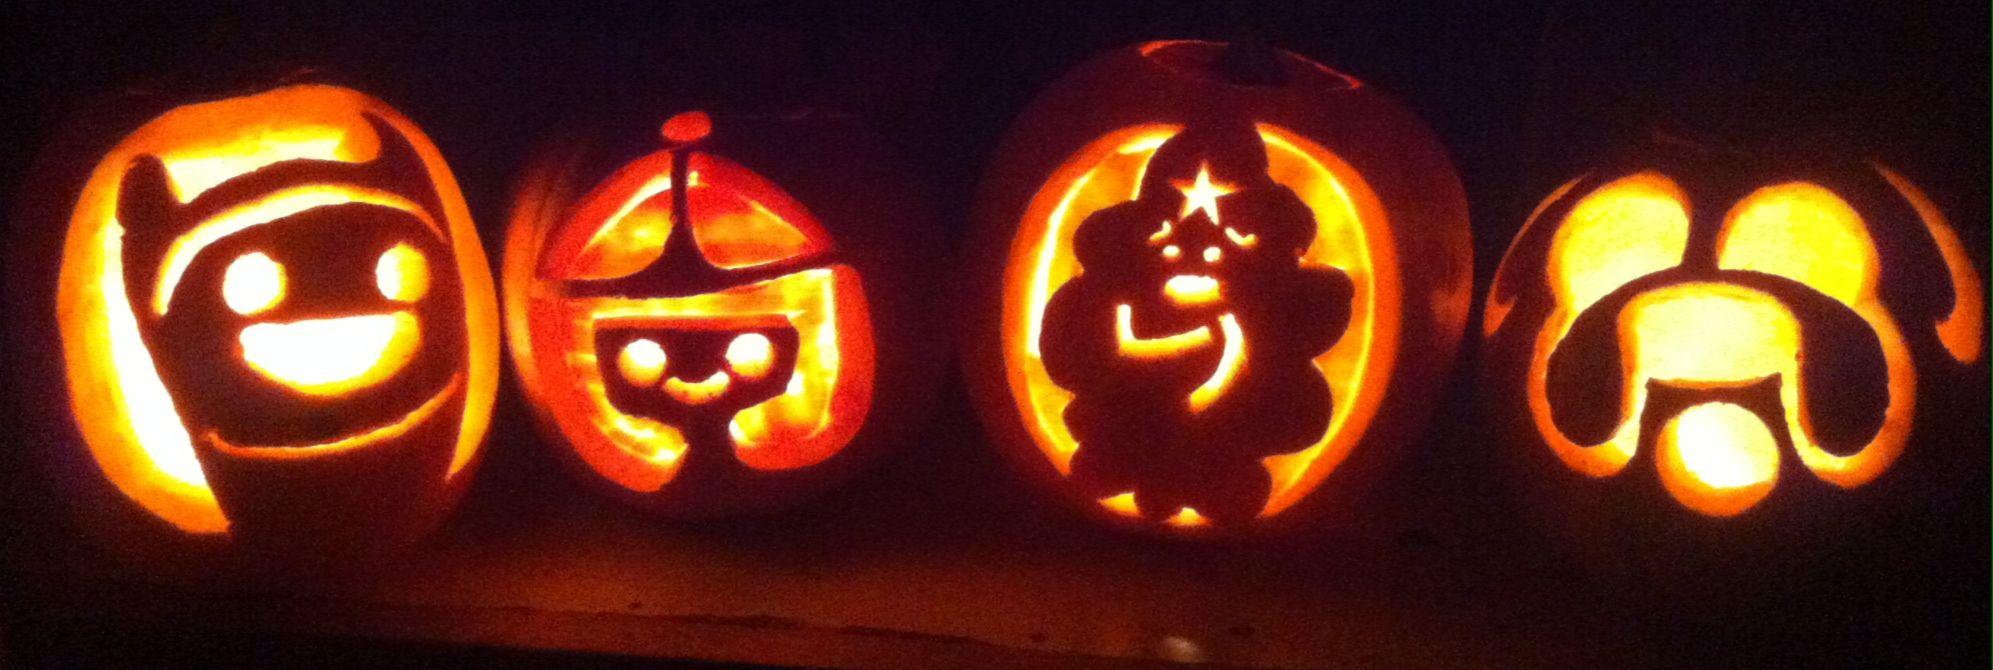 Adventure Time pumpkin carvings. Finn, Princess Bubblegum, Lumpy Space Princess and Jake